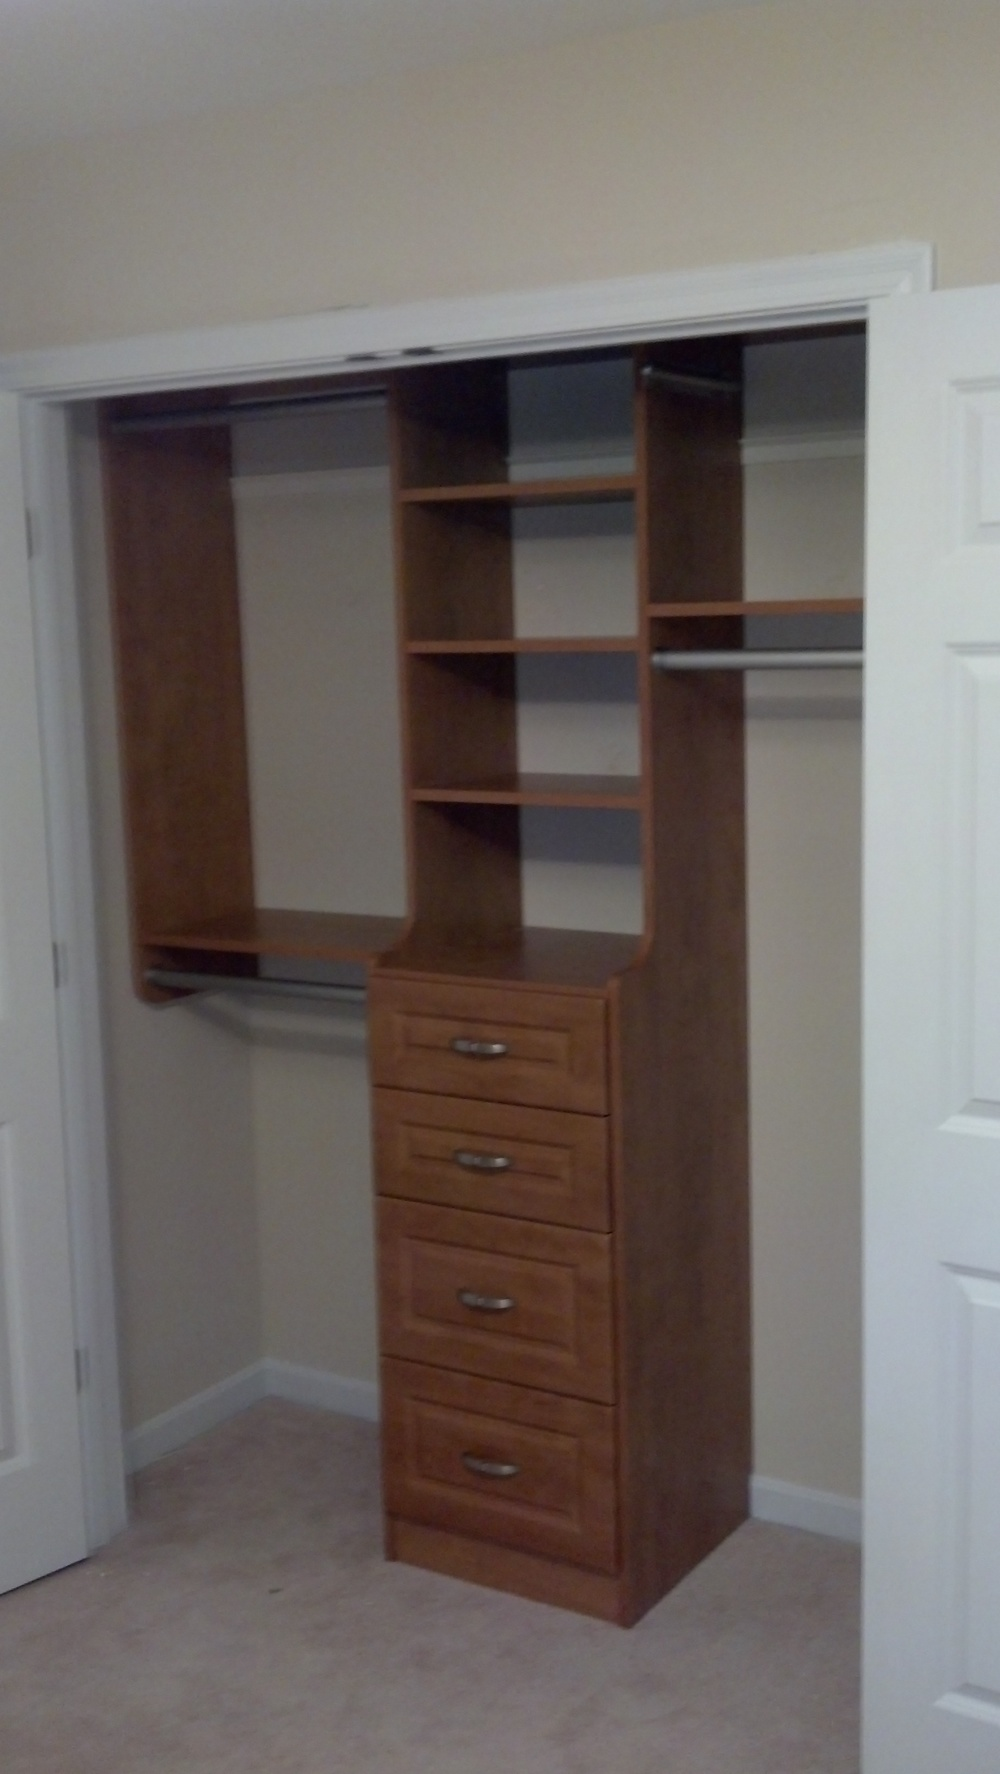 Mariemont Custom Closet Organizer Installation